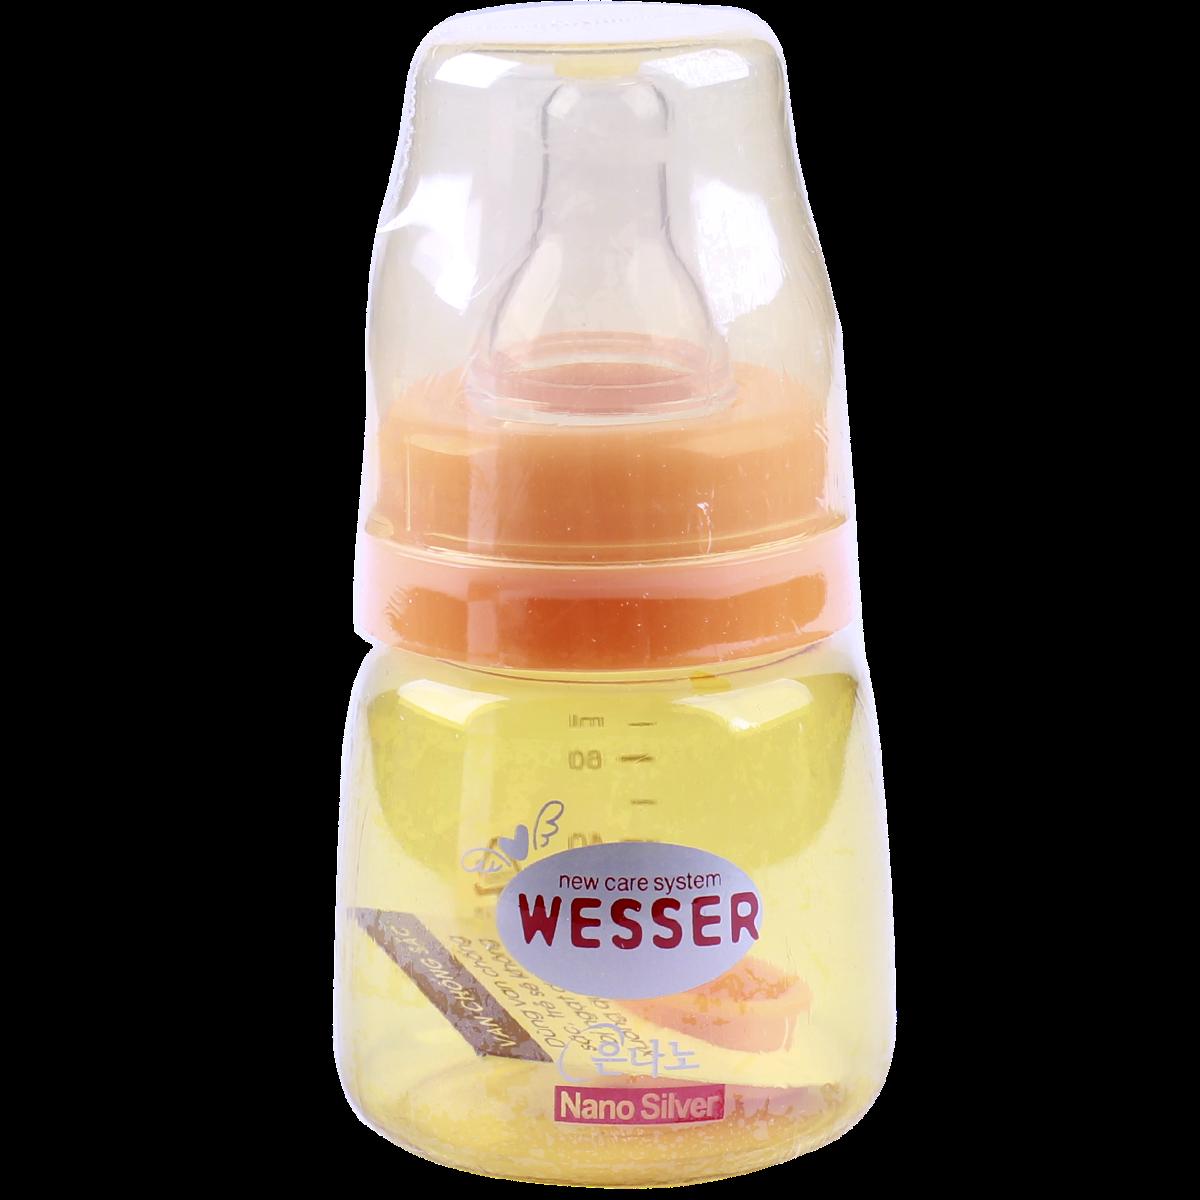 Bình sữa Nano Silver Wesser 60ml (cổ hẹp)